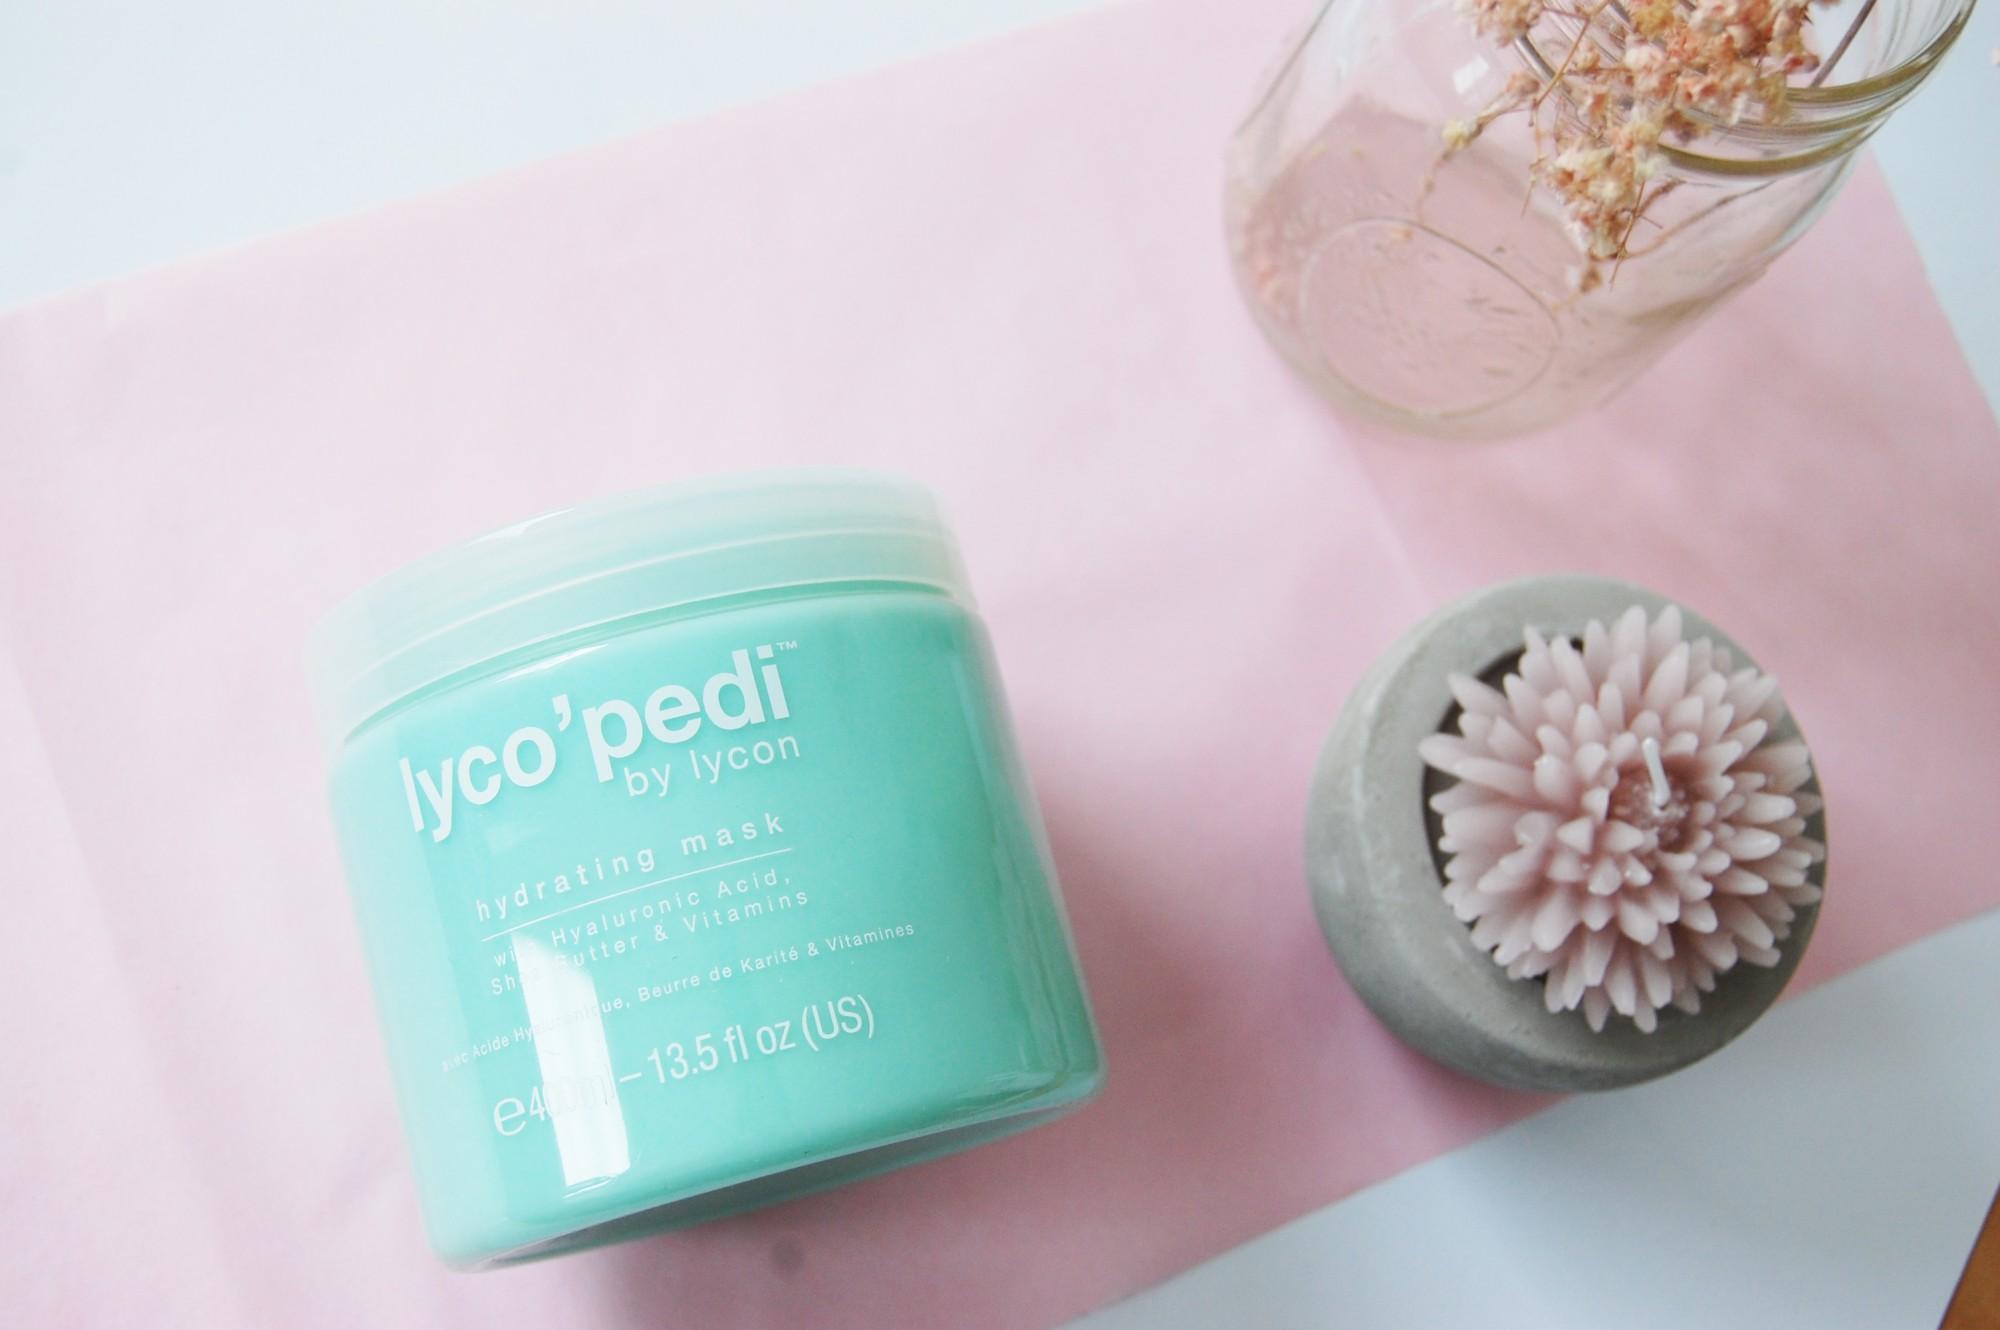 Lyco'Pedi by Lycon Hydraterend Voetmasker